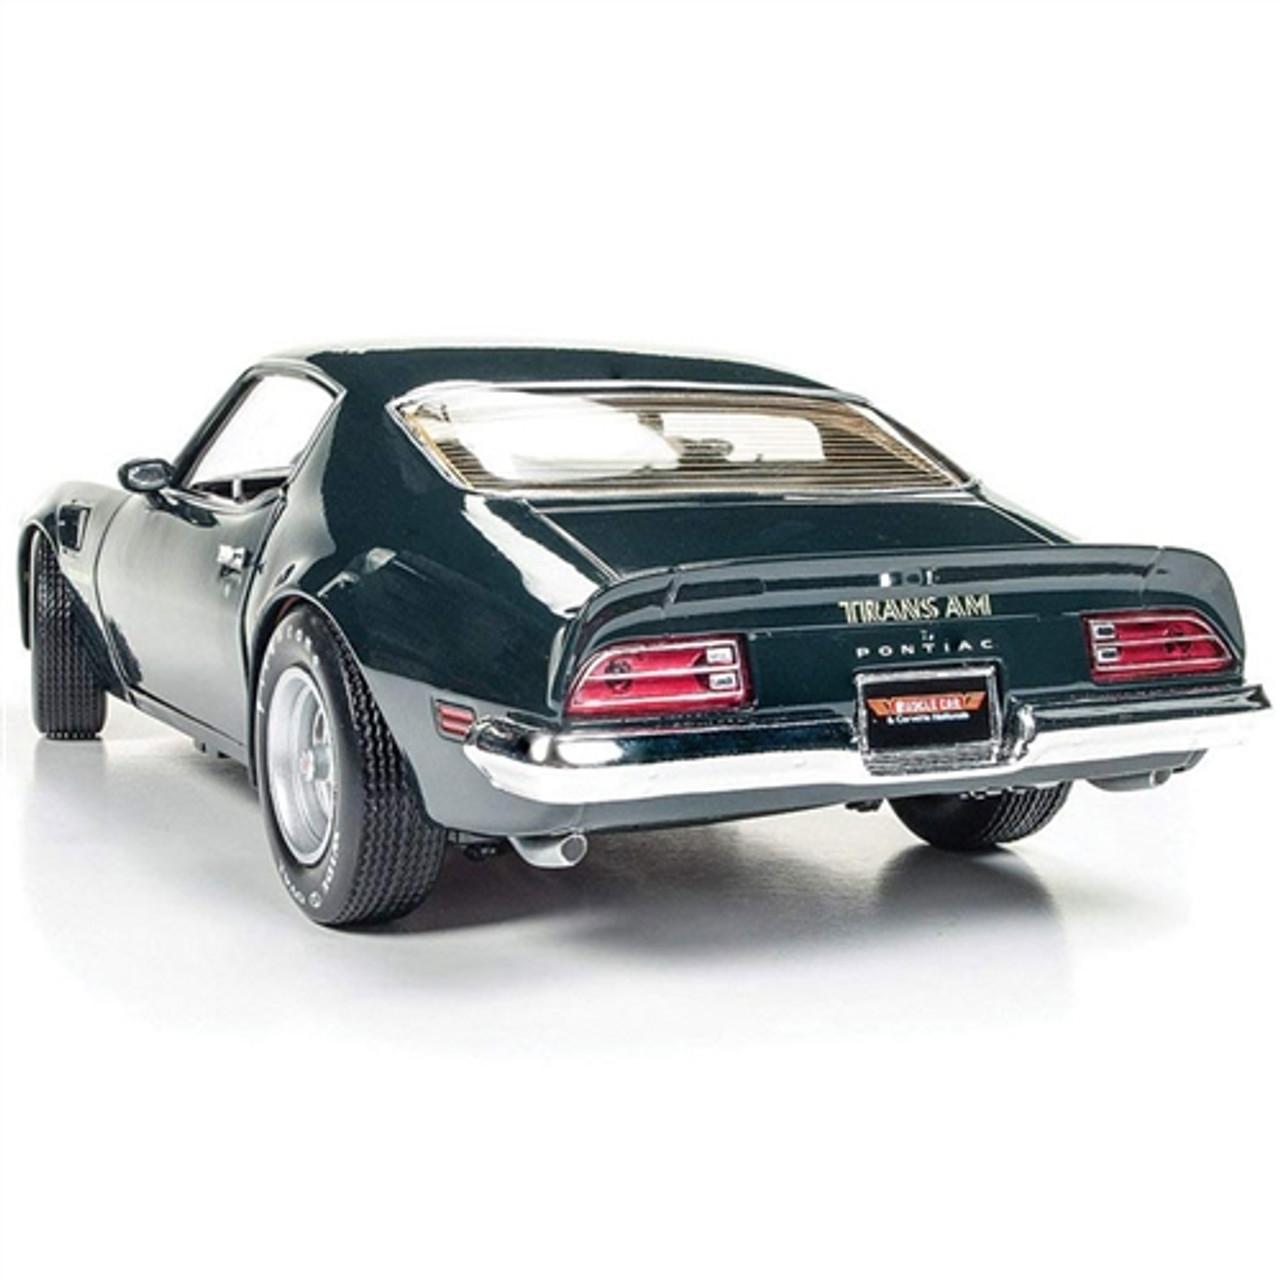 Auto World 1 18 Diecast 1973 Pontiac Firebird Trans Am Mcacn